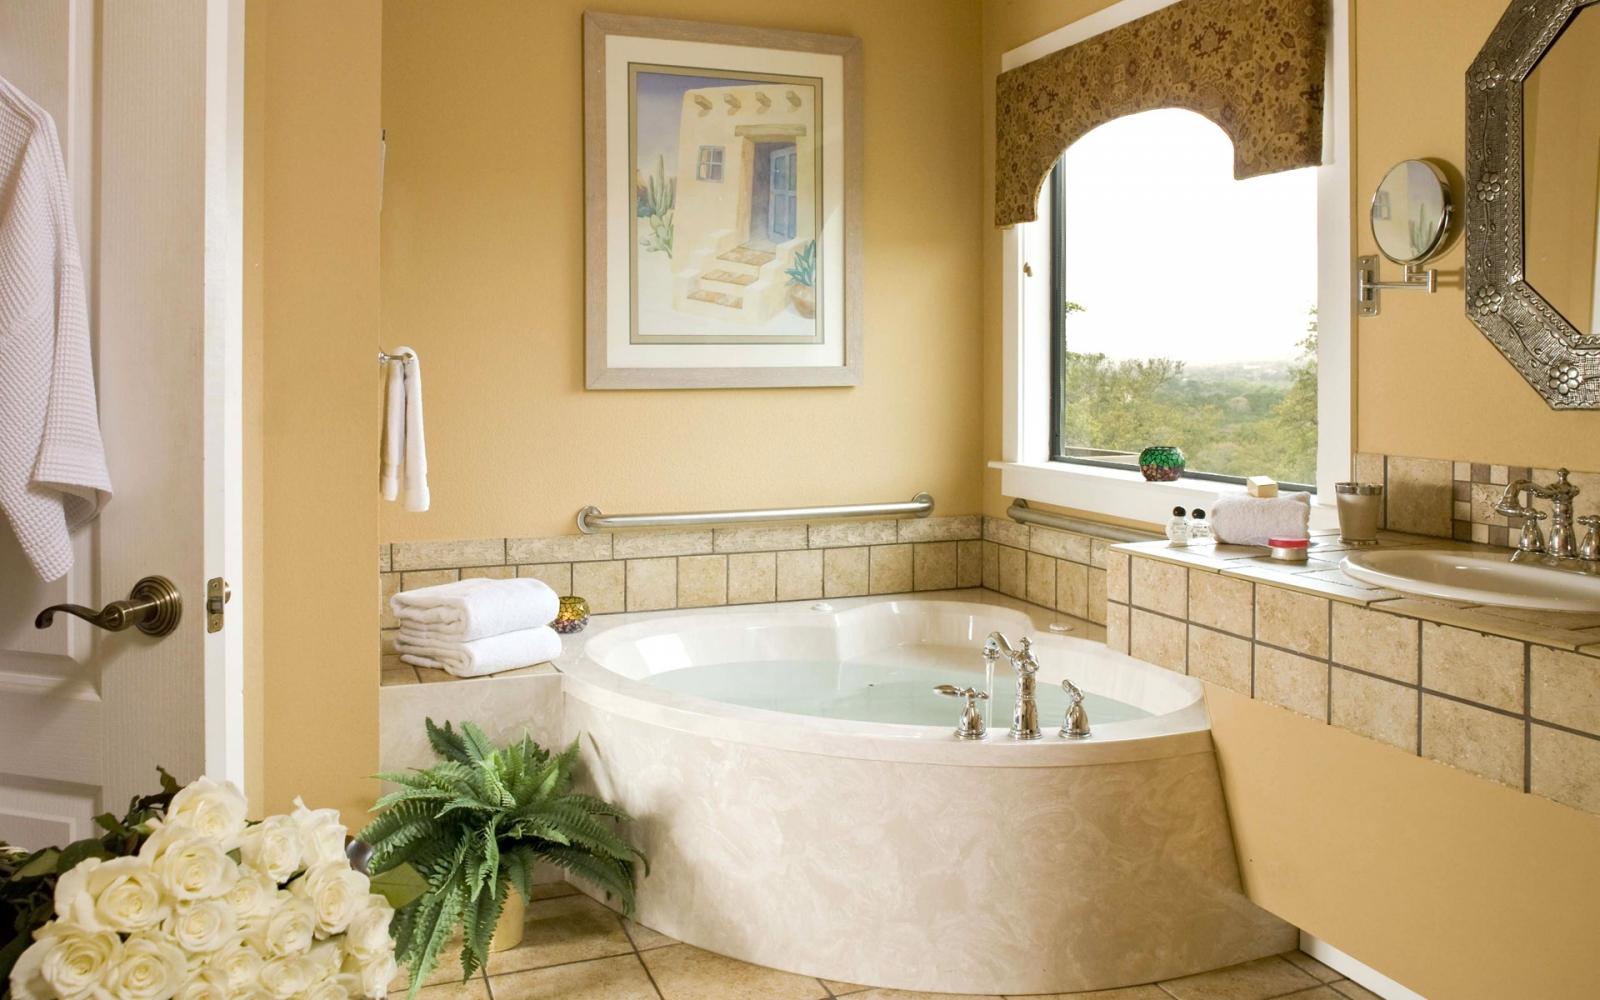 Фото интерьеров квартир интерьер ванных комнат 10 фотография